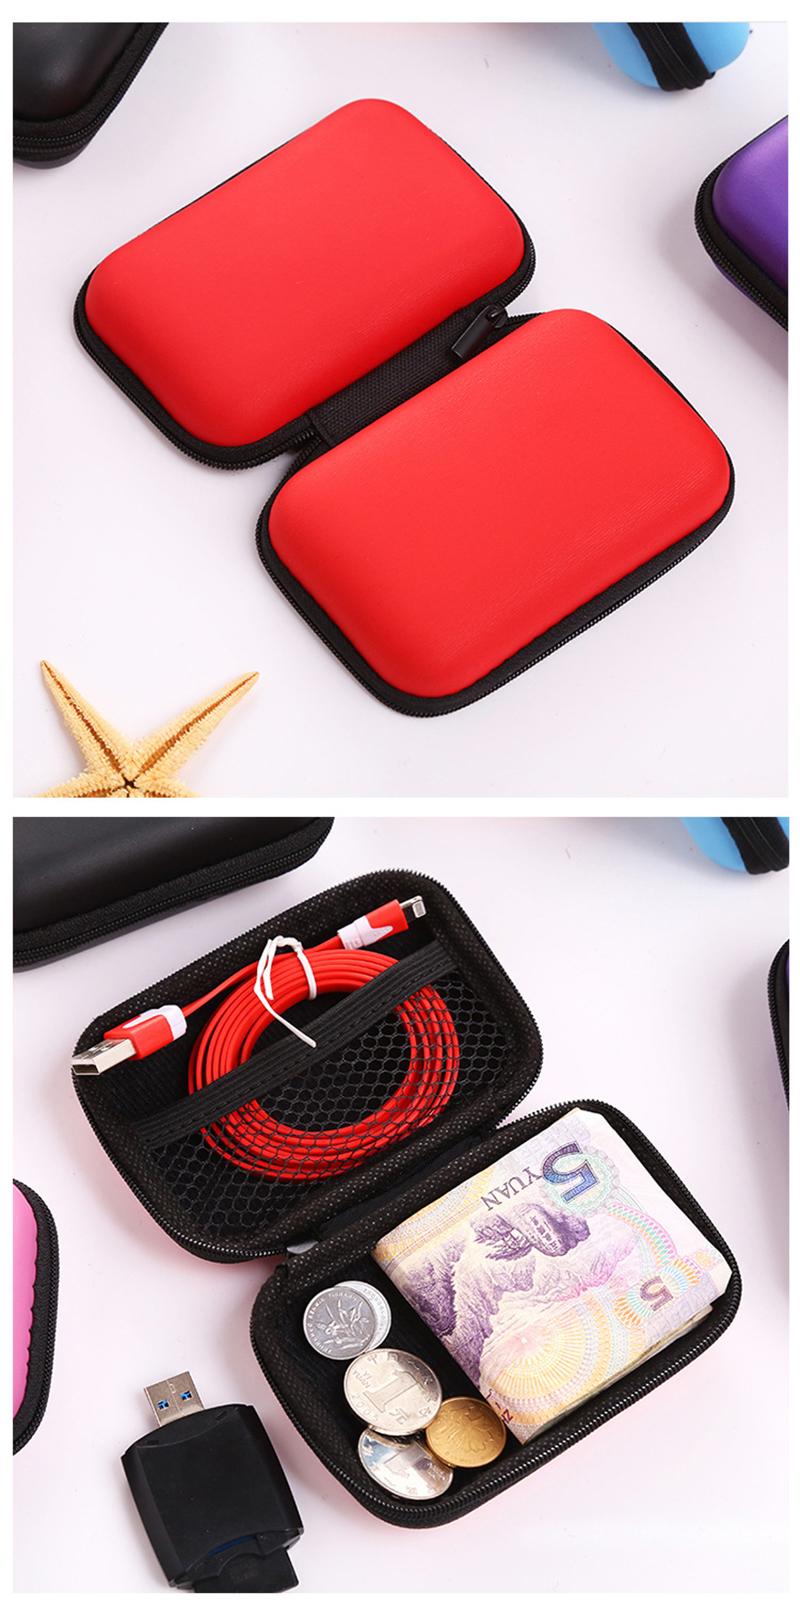 prativerdi Zippered Lock Hard Earphone Case EVA Leather Headphone Storage Bag Protective Usb Cable Portable travel Organizer4